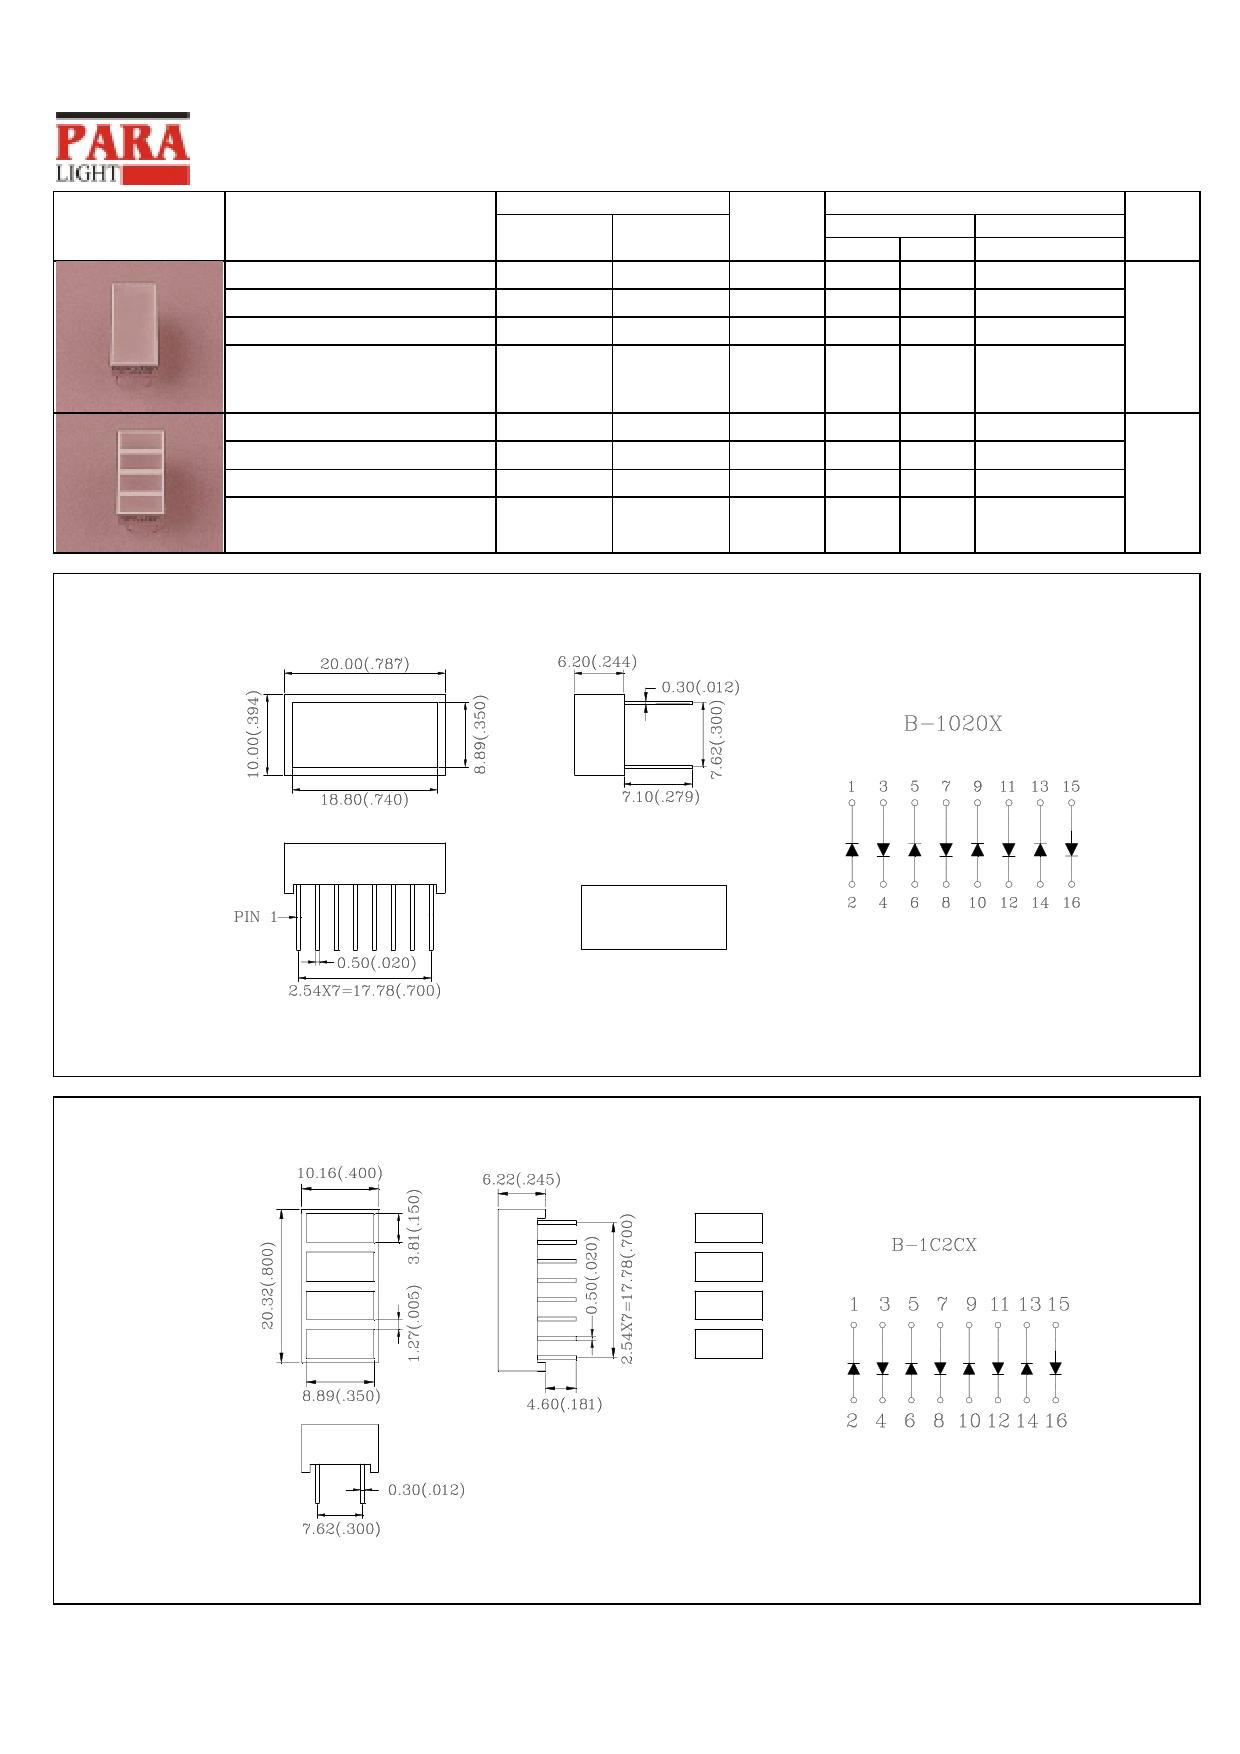 B-1C2CG даташит PDF